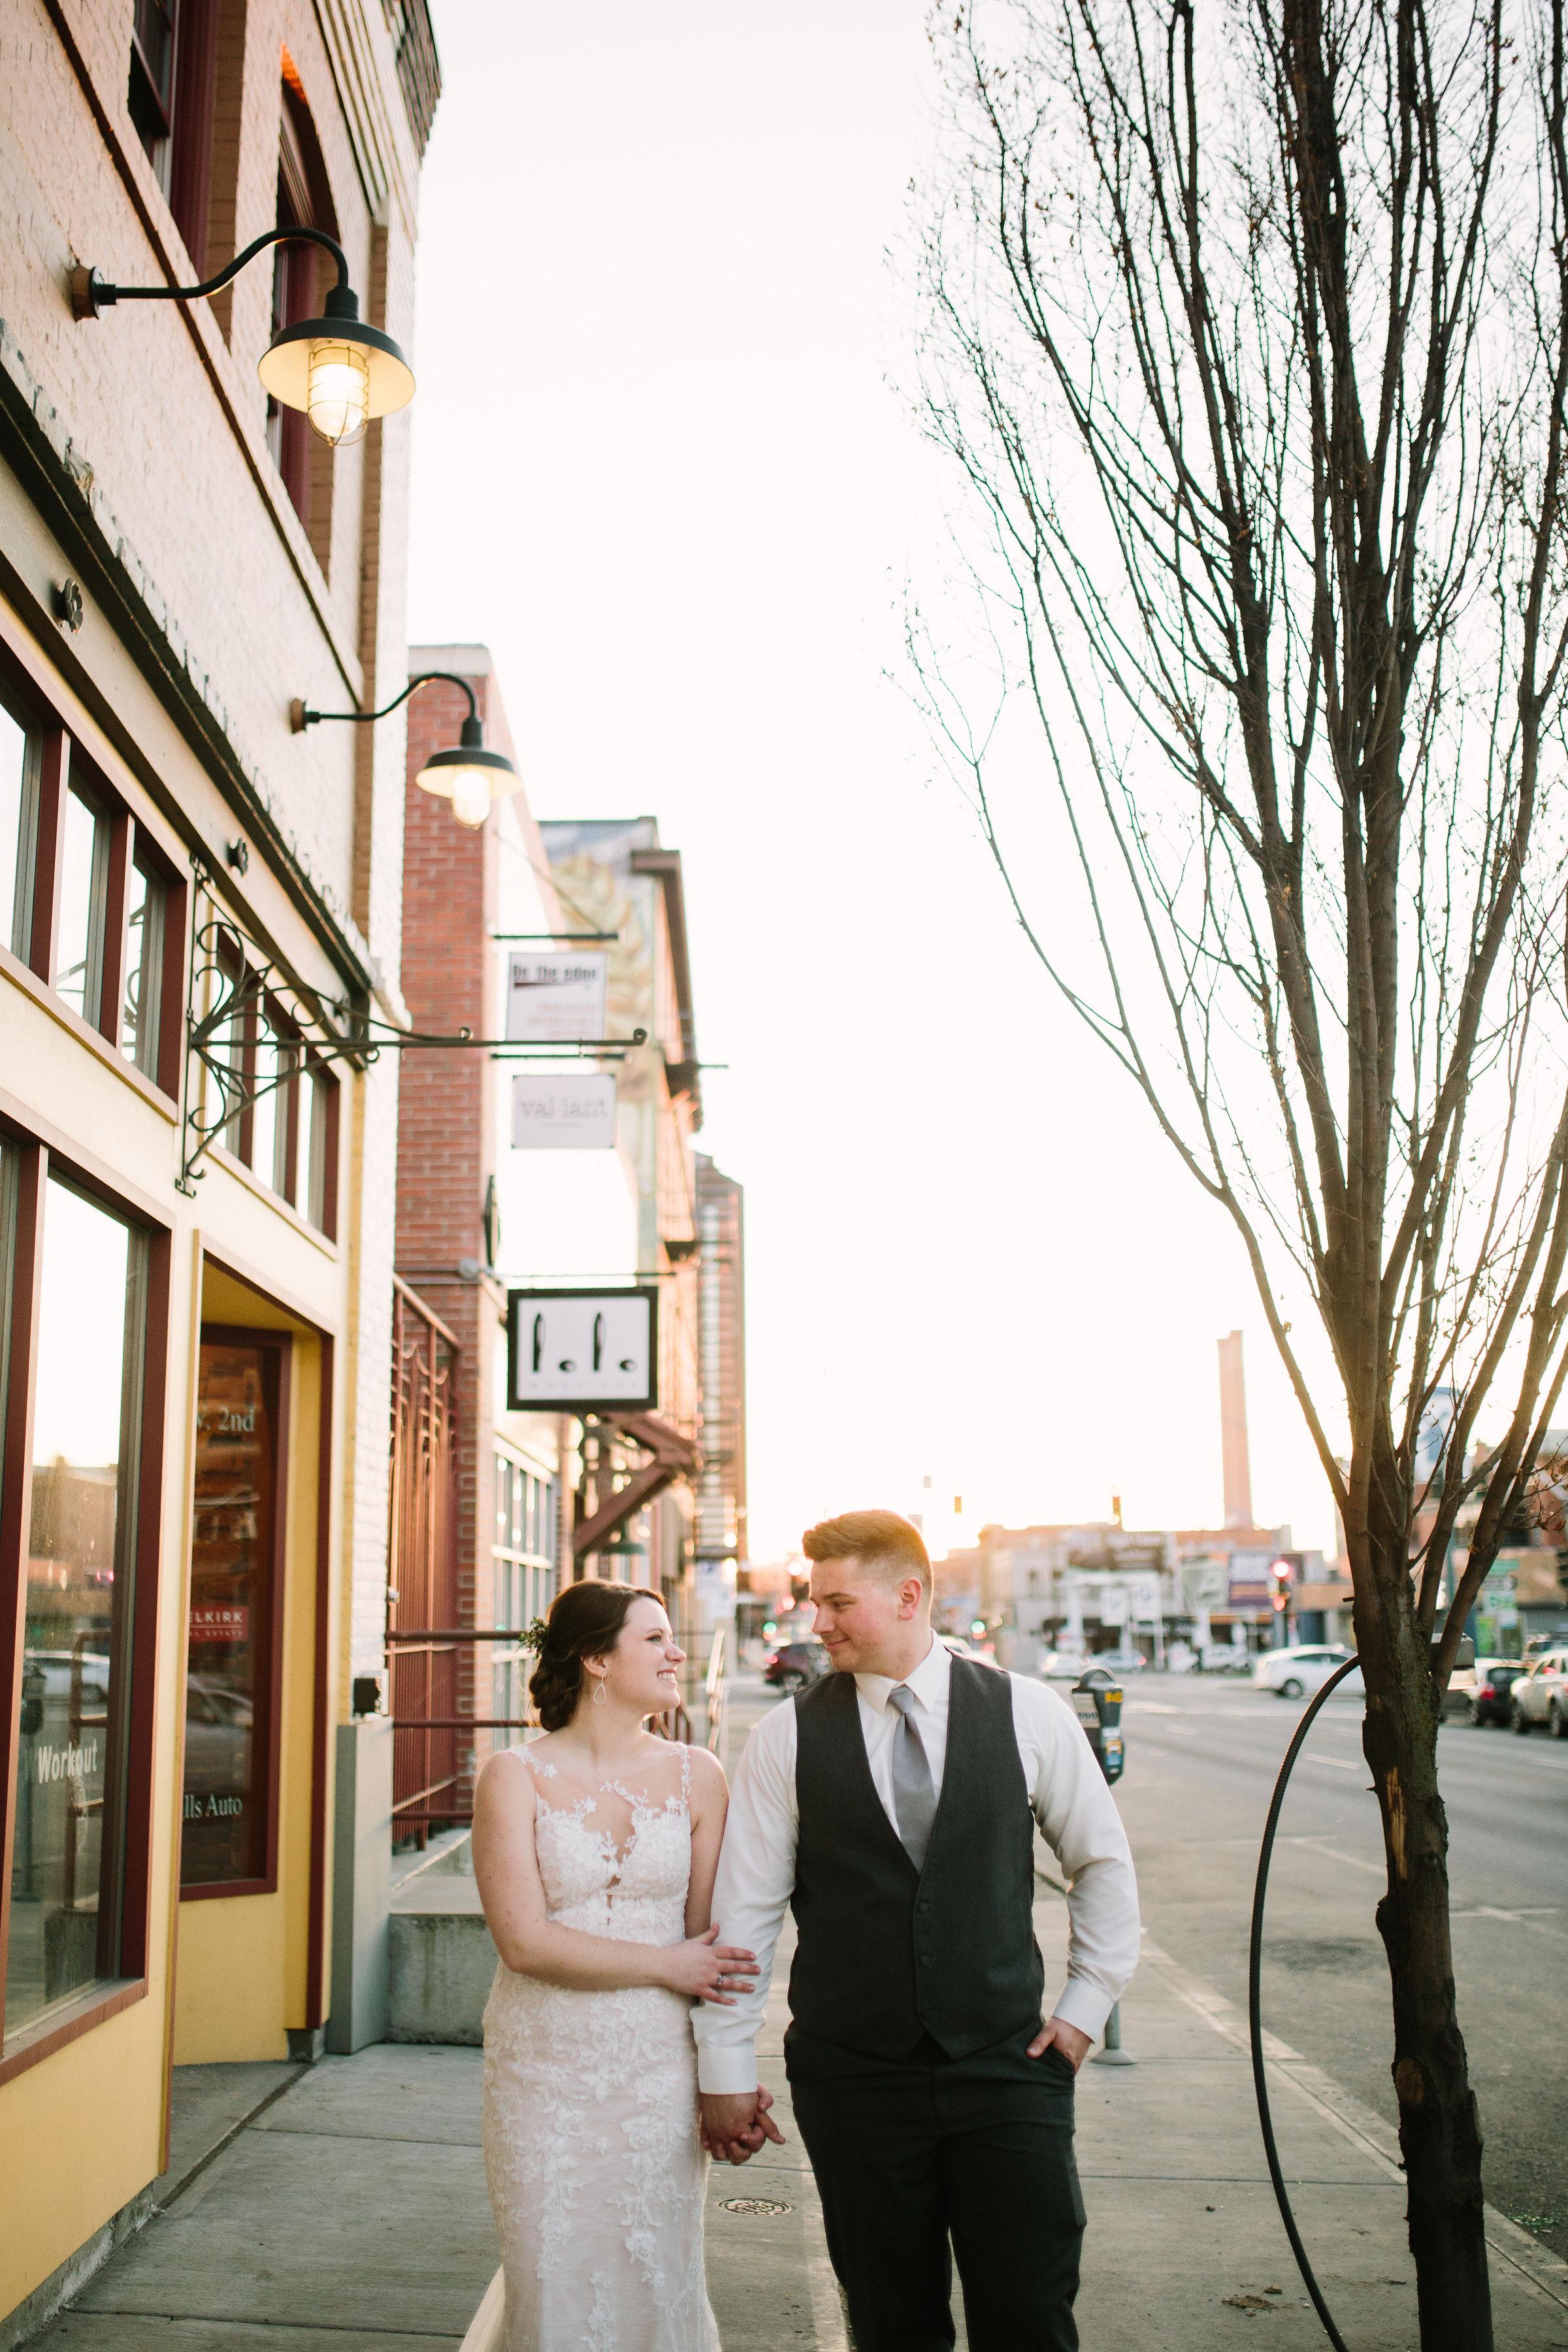 Fun Rustic spokane wedding bride holding groom smiling happy